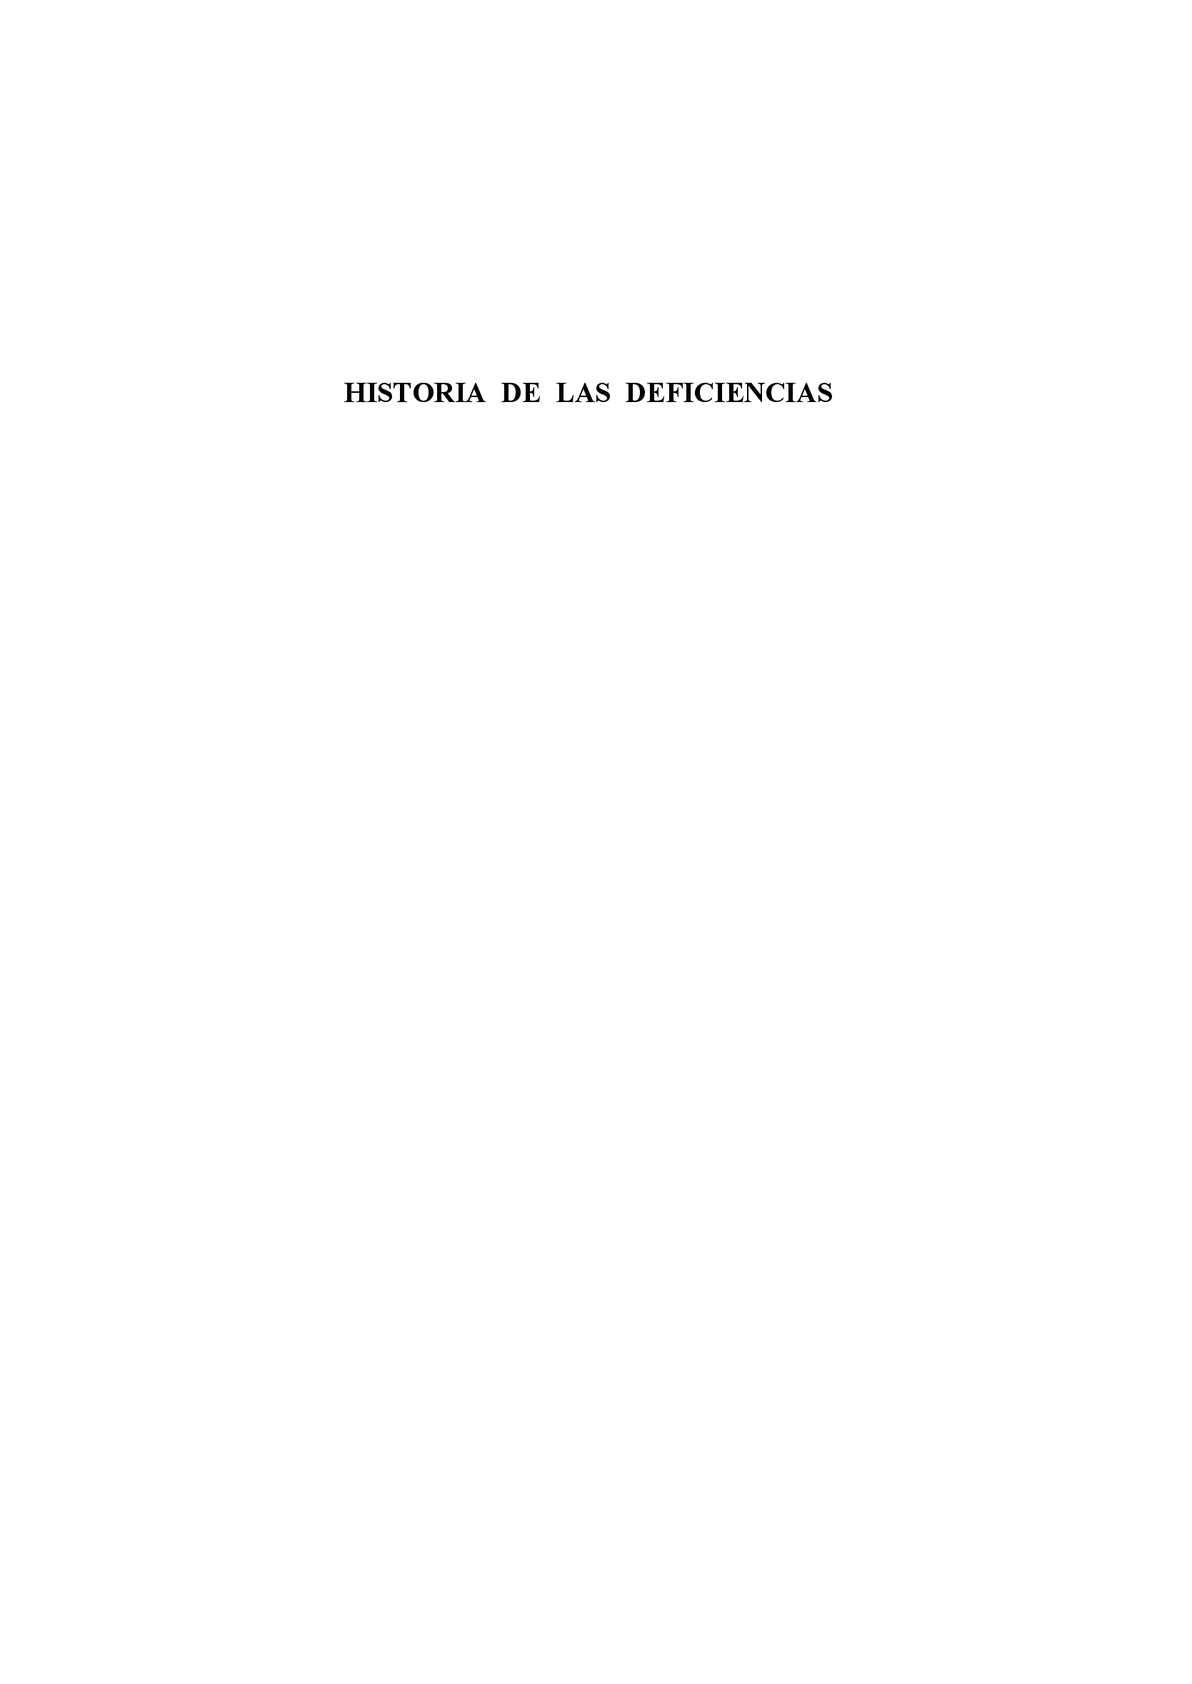 Calaméo - Librohistoriadelasdeficiencias